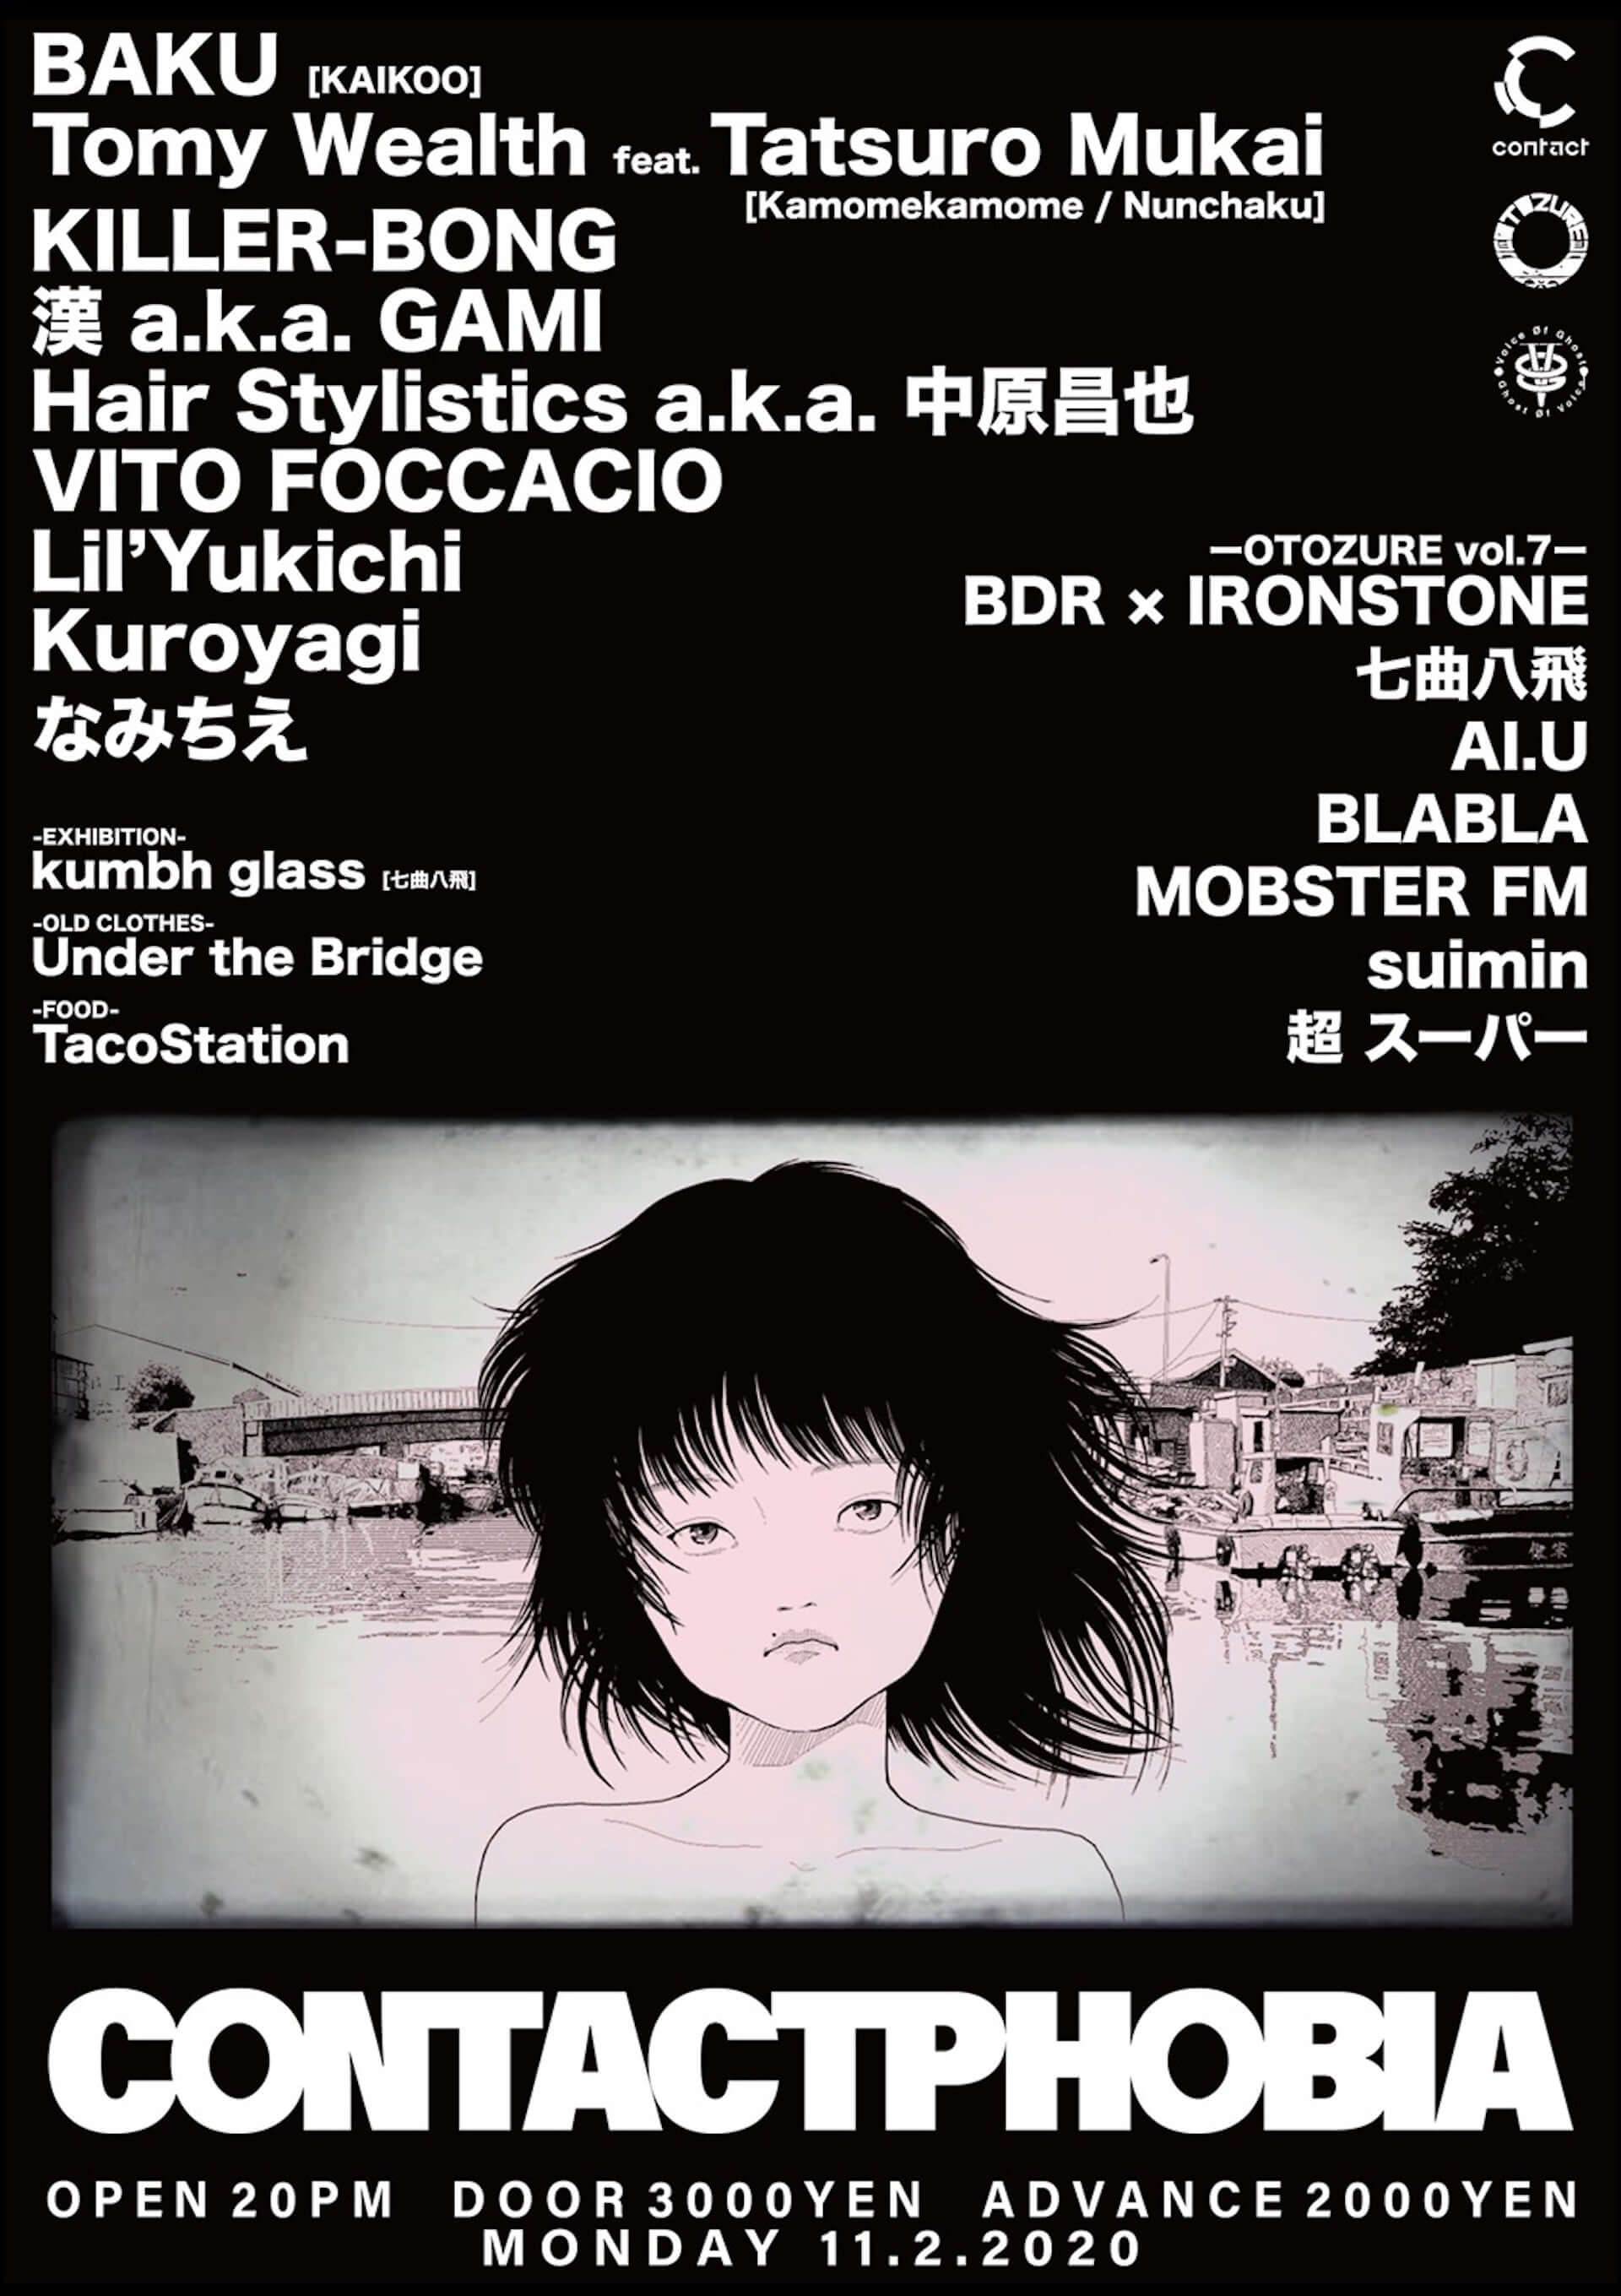 BAKUが音楽を担当した映画『VIDEOPHOBIA』の公開記念イベントが渋谷Contactにて開催決定!Tomy Wealth、KILLER-BONGらが出演 music201030_contact-videophobia_1-1920x2719